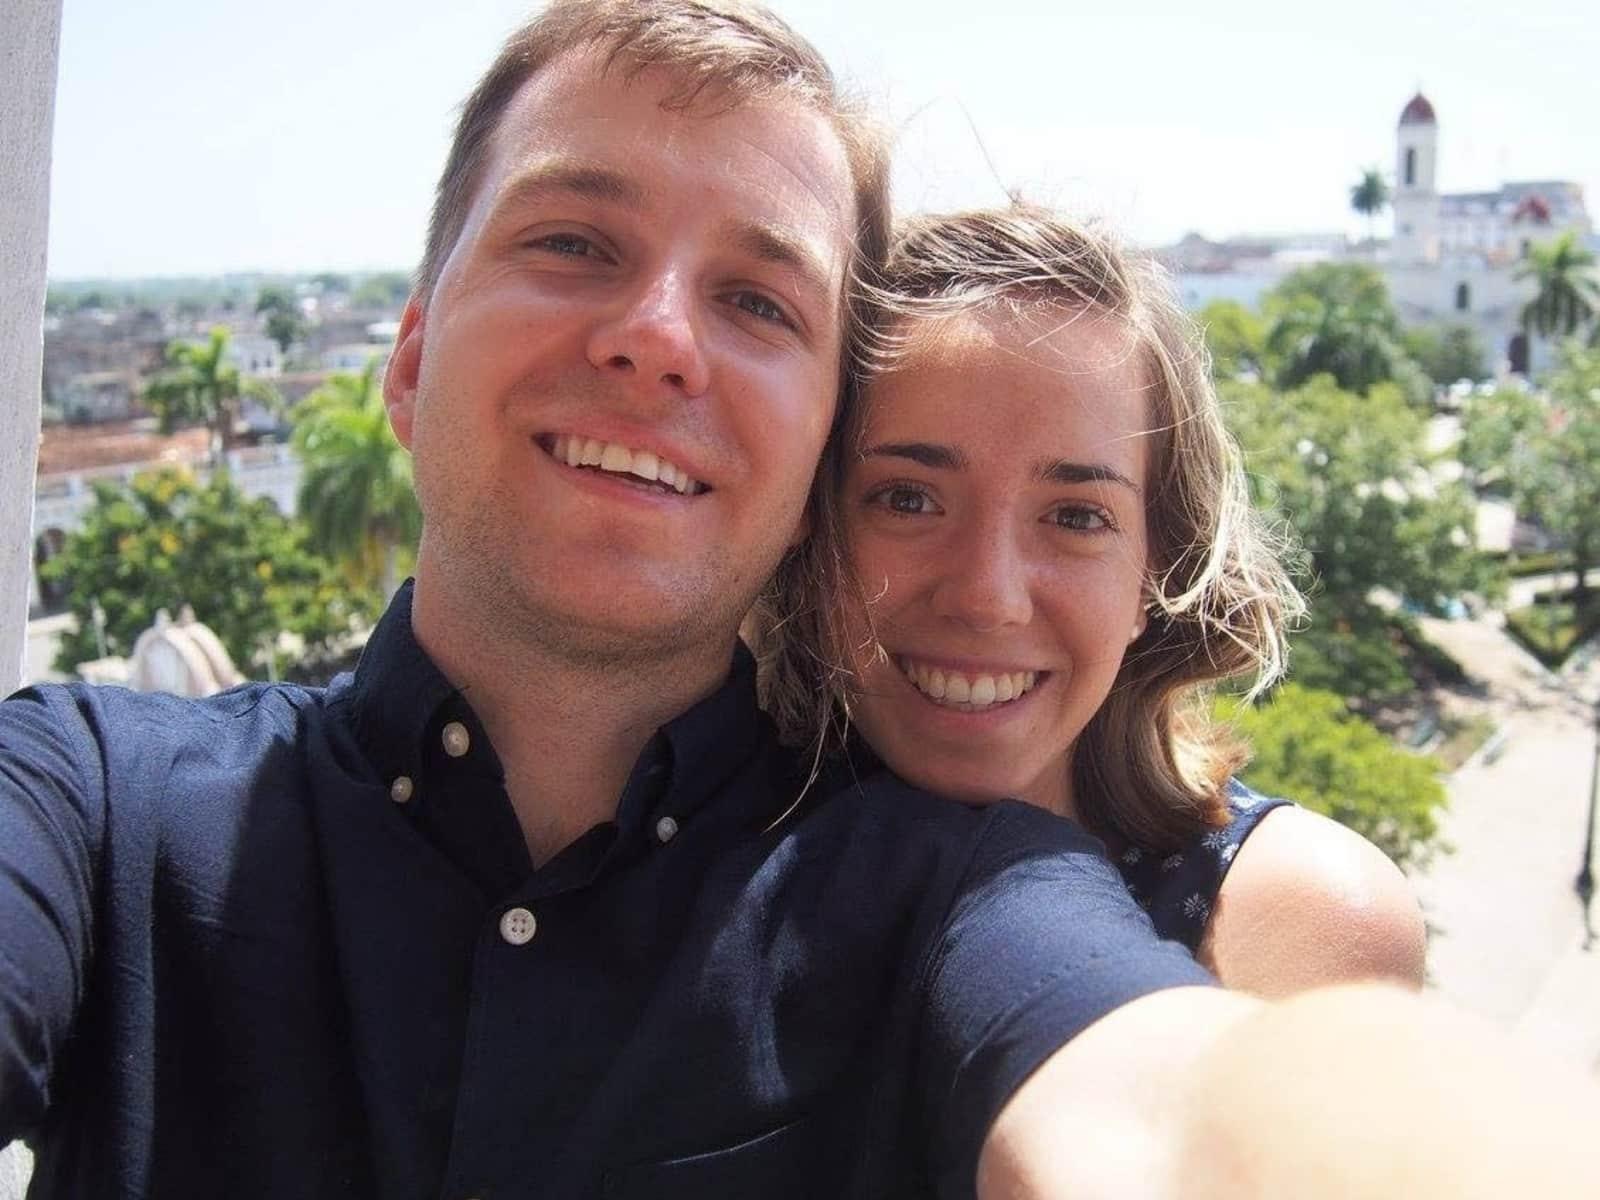 Marek e. & Nora from Brisbane, Queensland, Australia